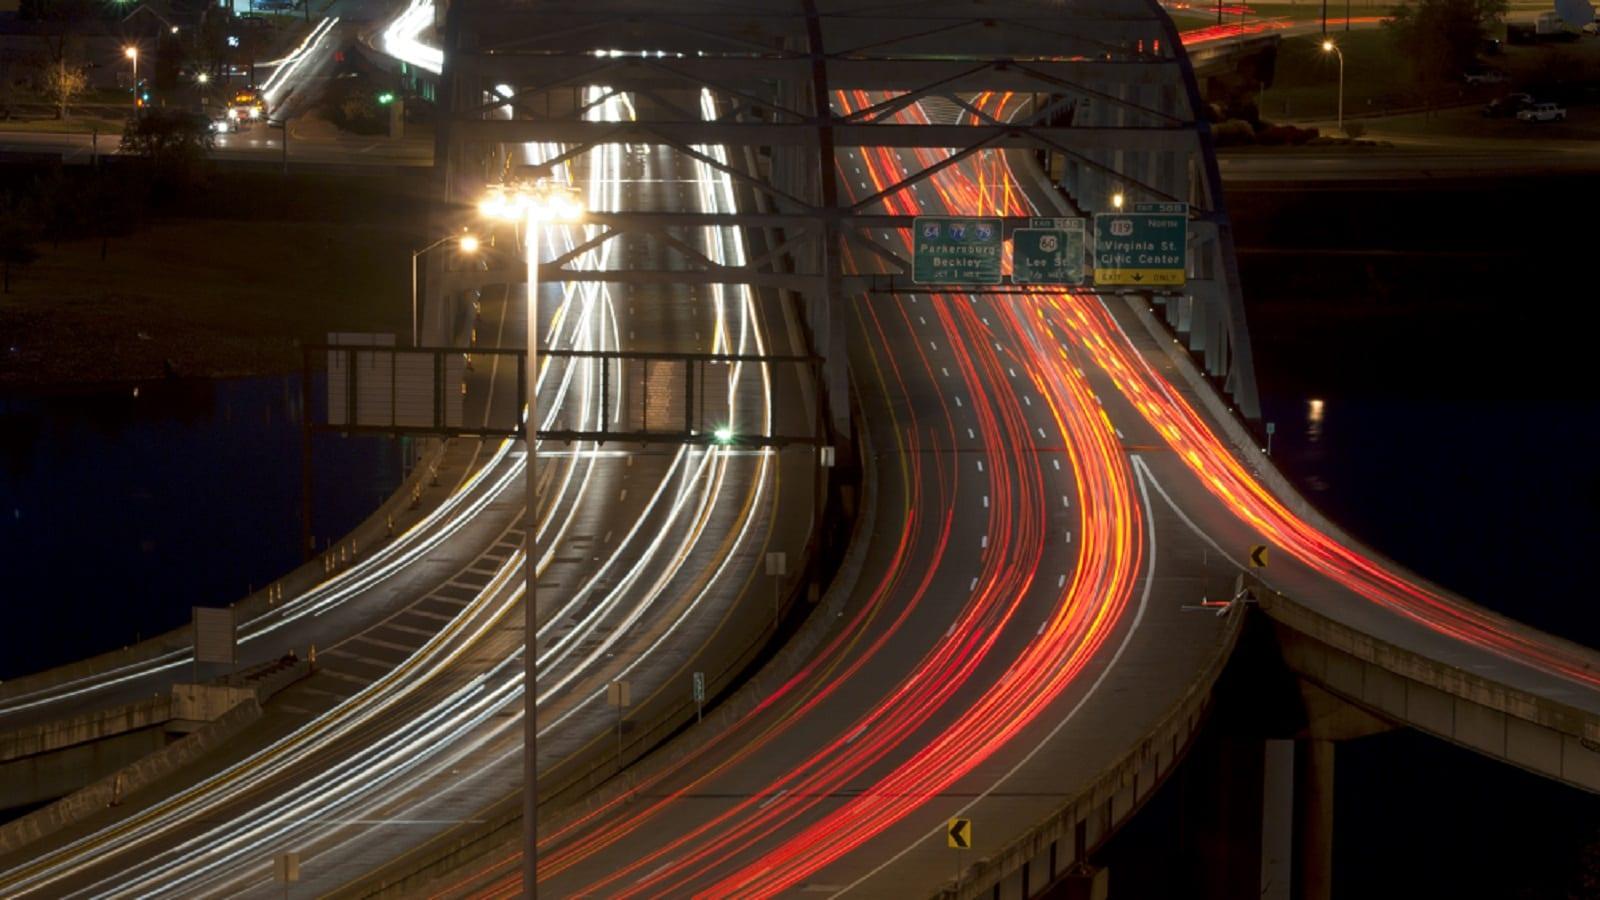 West-Virginia-Highway-At-Night